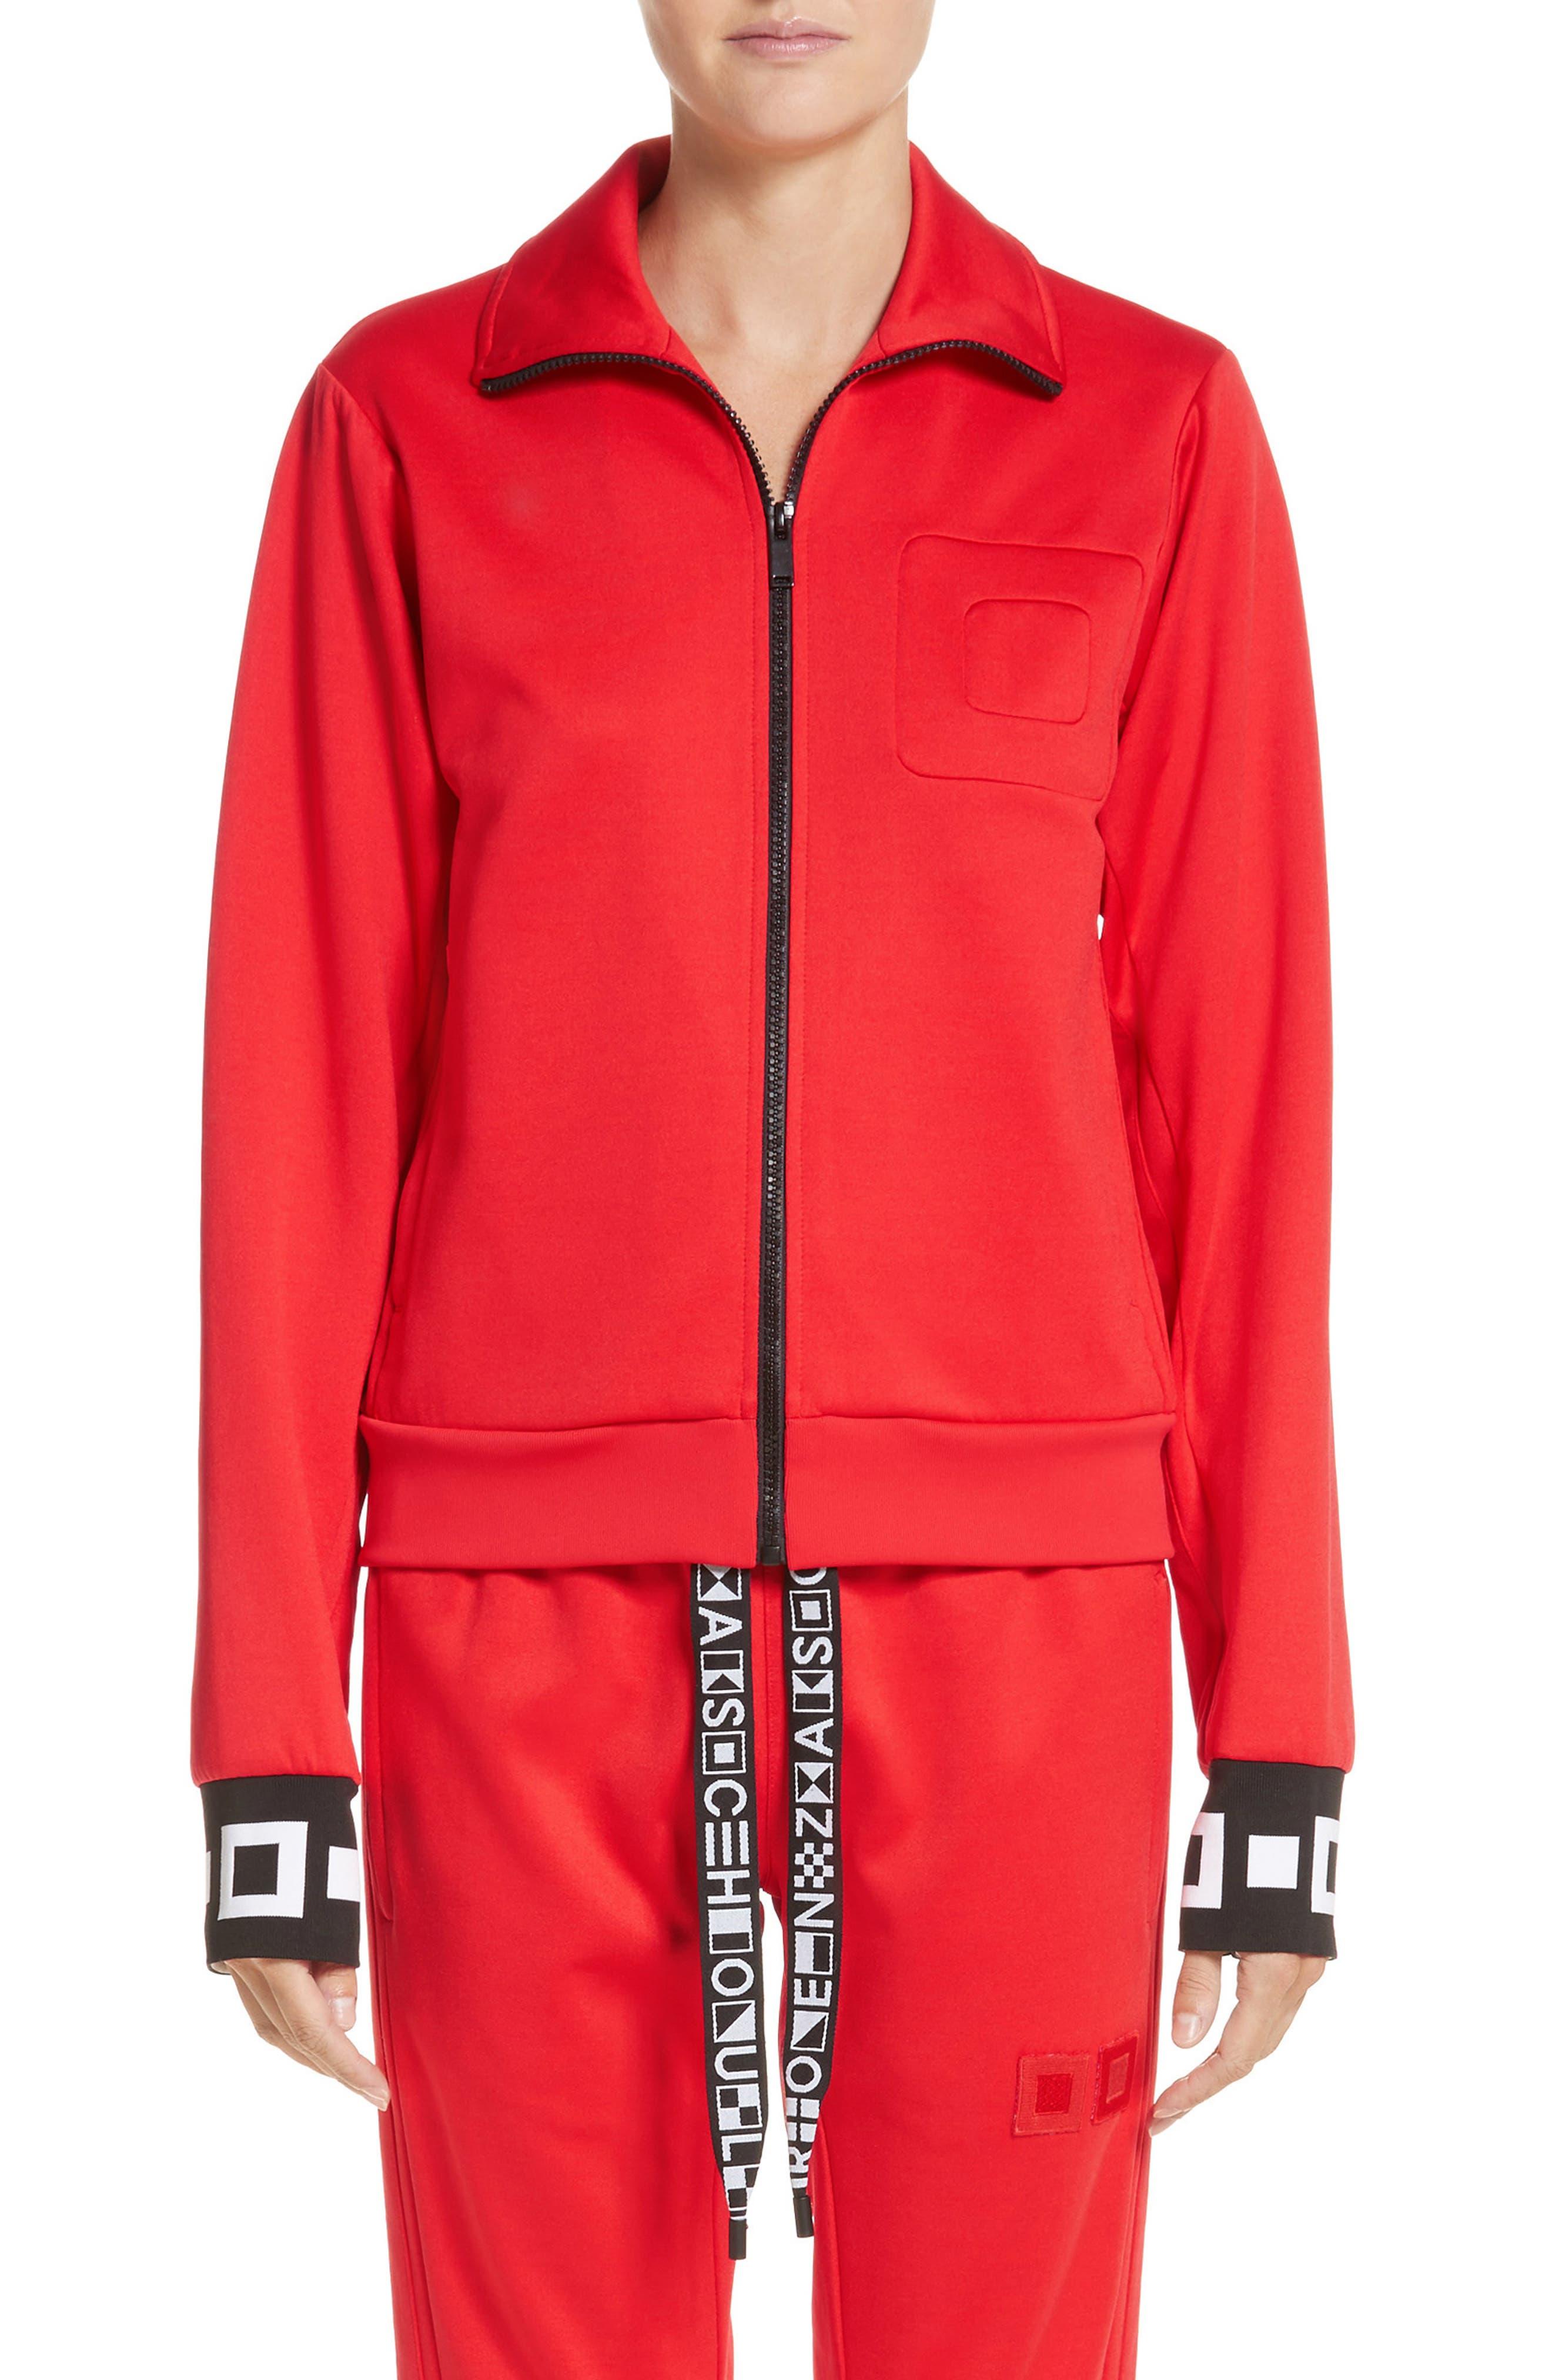 Alternate Image 1 Selected - Proenza Schouler PSWL Jersey Track Jacket